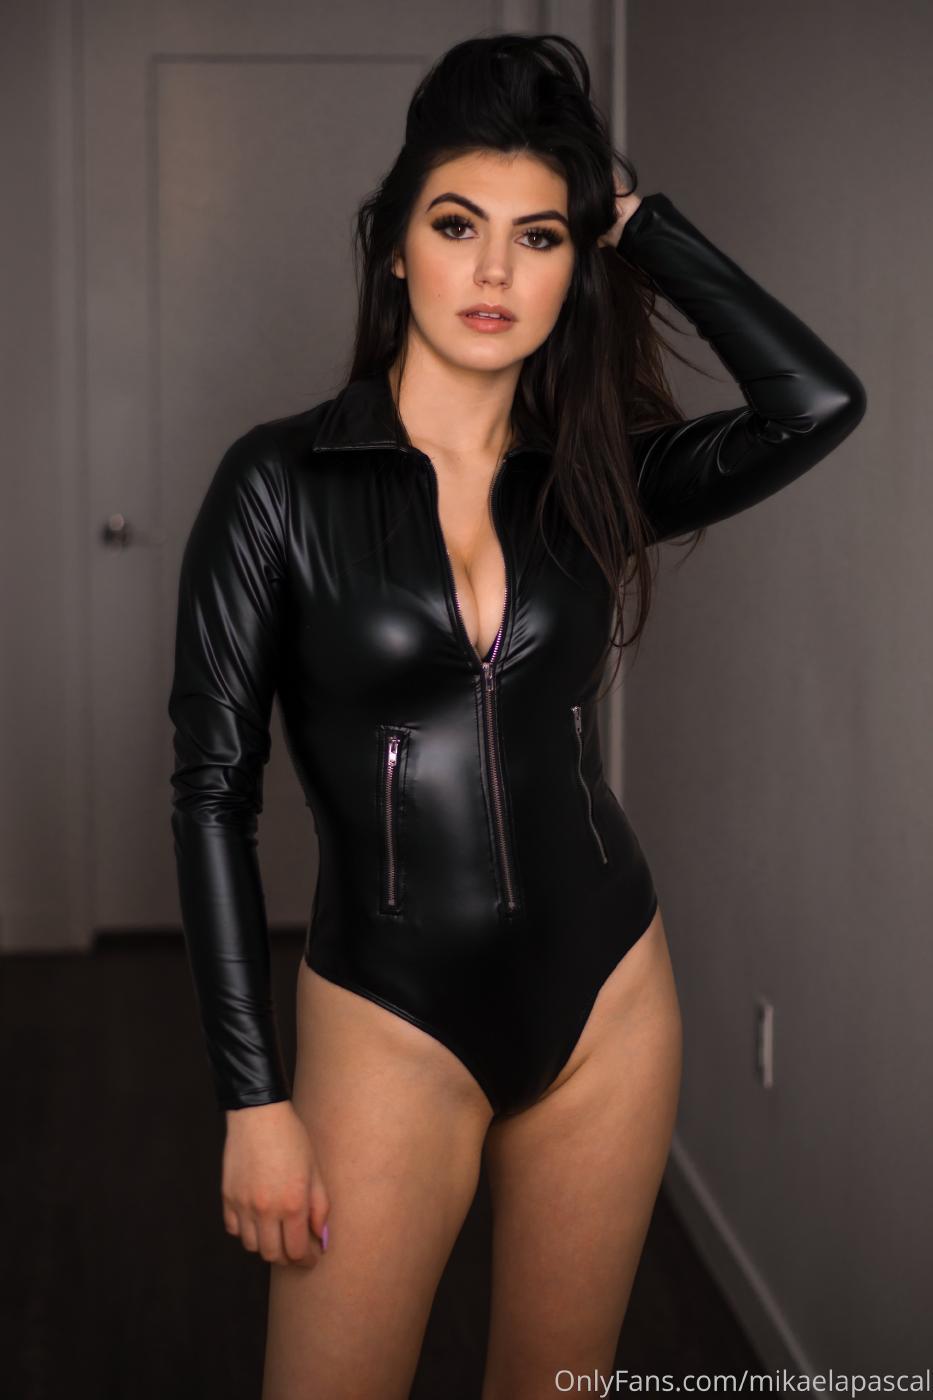 Mikaela Pascal Sexy Leather Bodysuit Onlyfans Set Leaked 0015